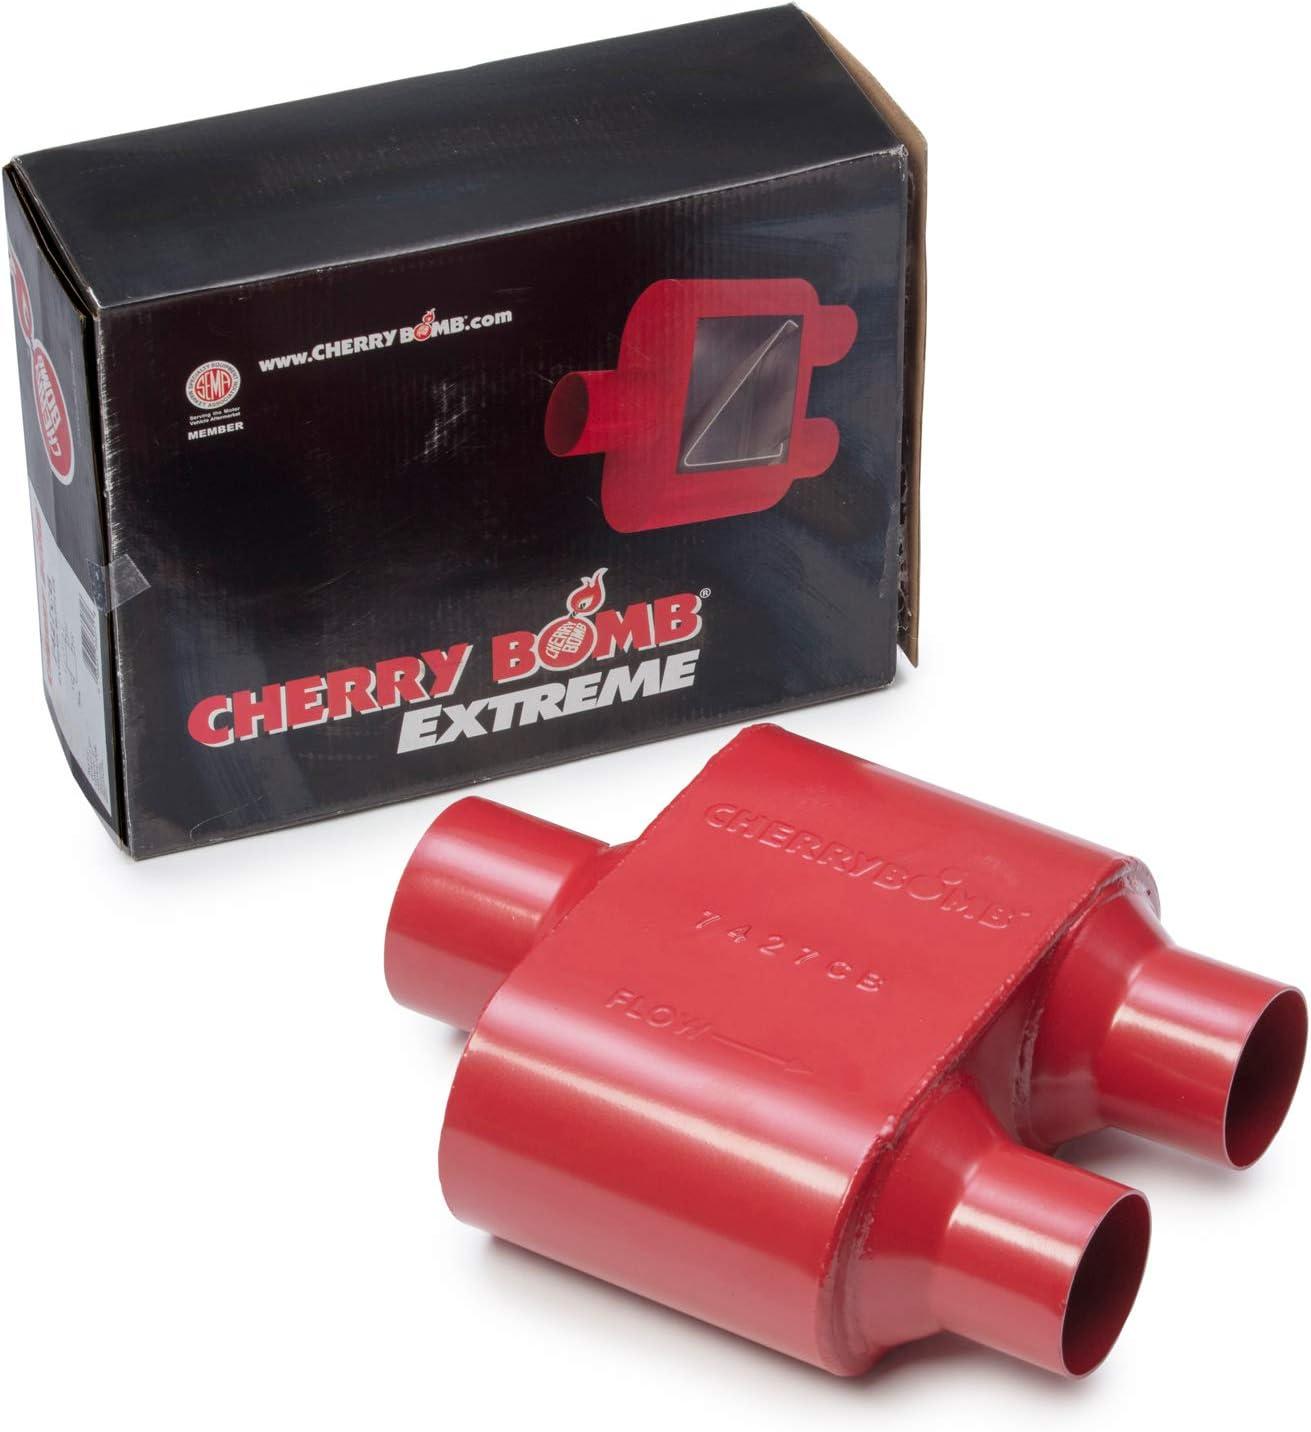 "04-08 Dodge Ram 1500 2.5/"" Dual Exhaust Cherry Bomb Extreme Side Exit"